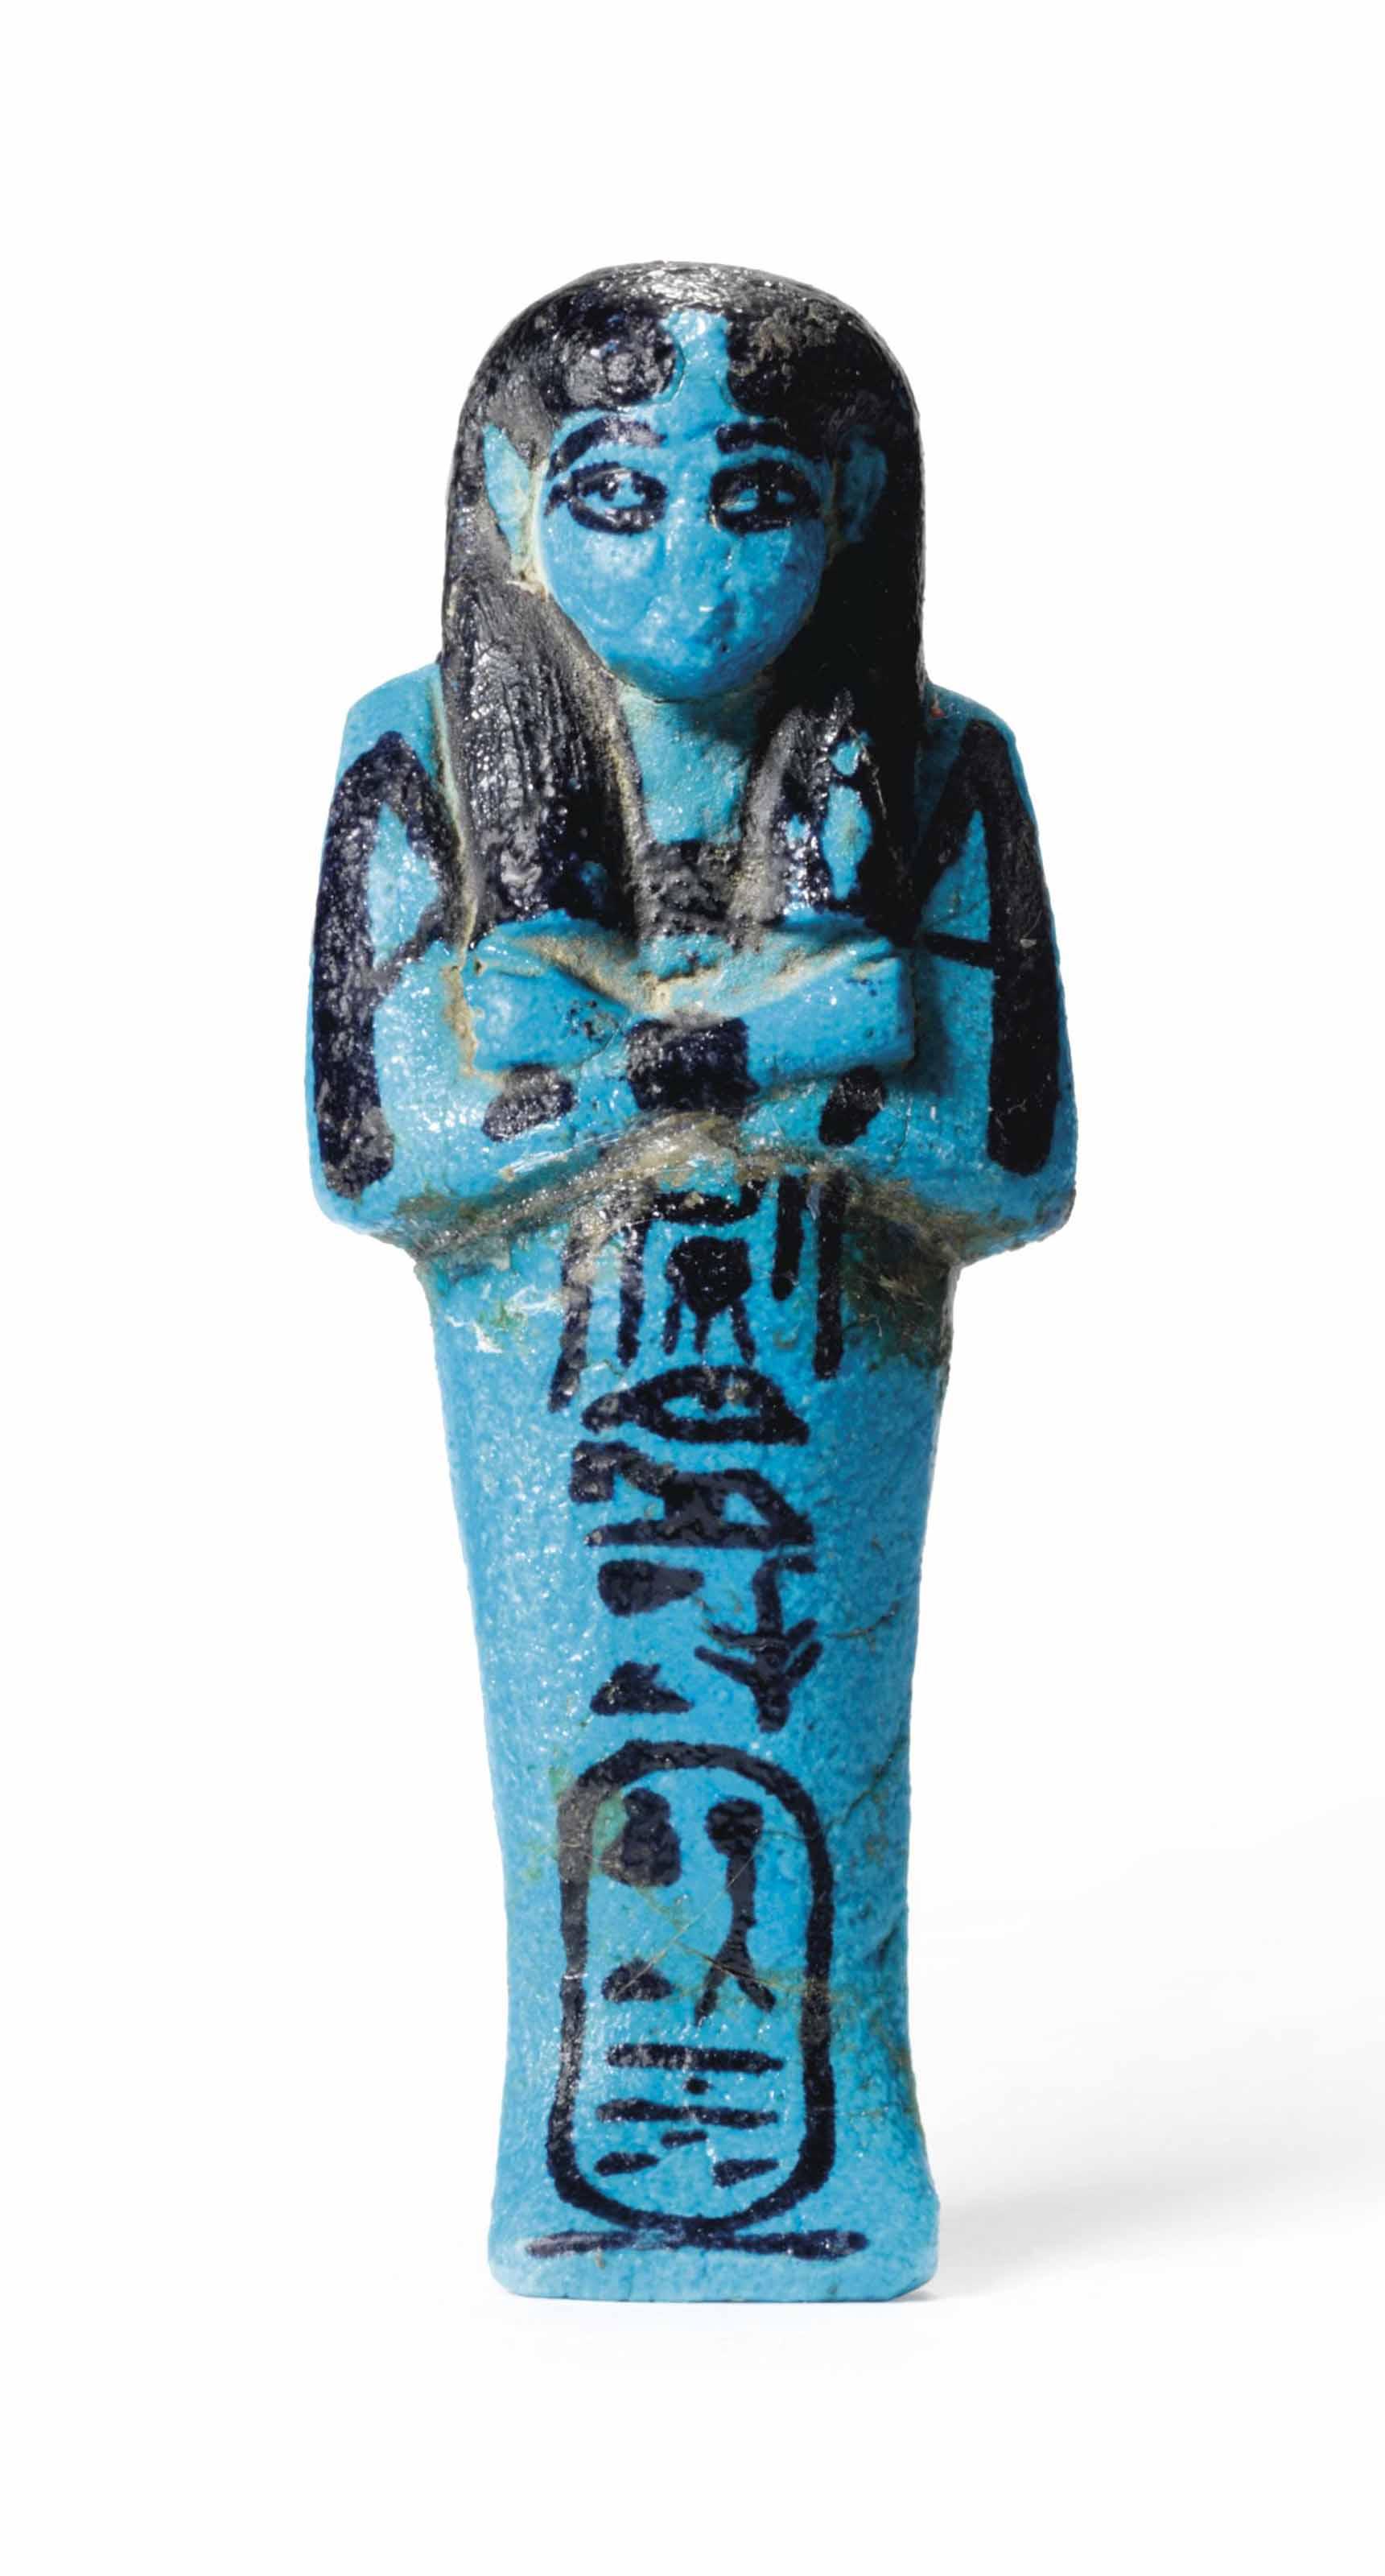 AN EGYPTIAN BLUE FAIENCE SHABTI FOR QUEEN HENUTTAWY